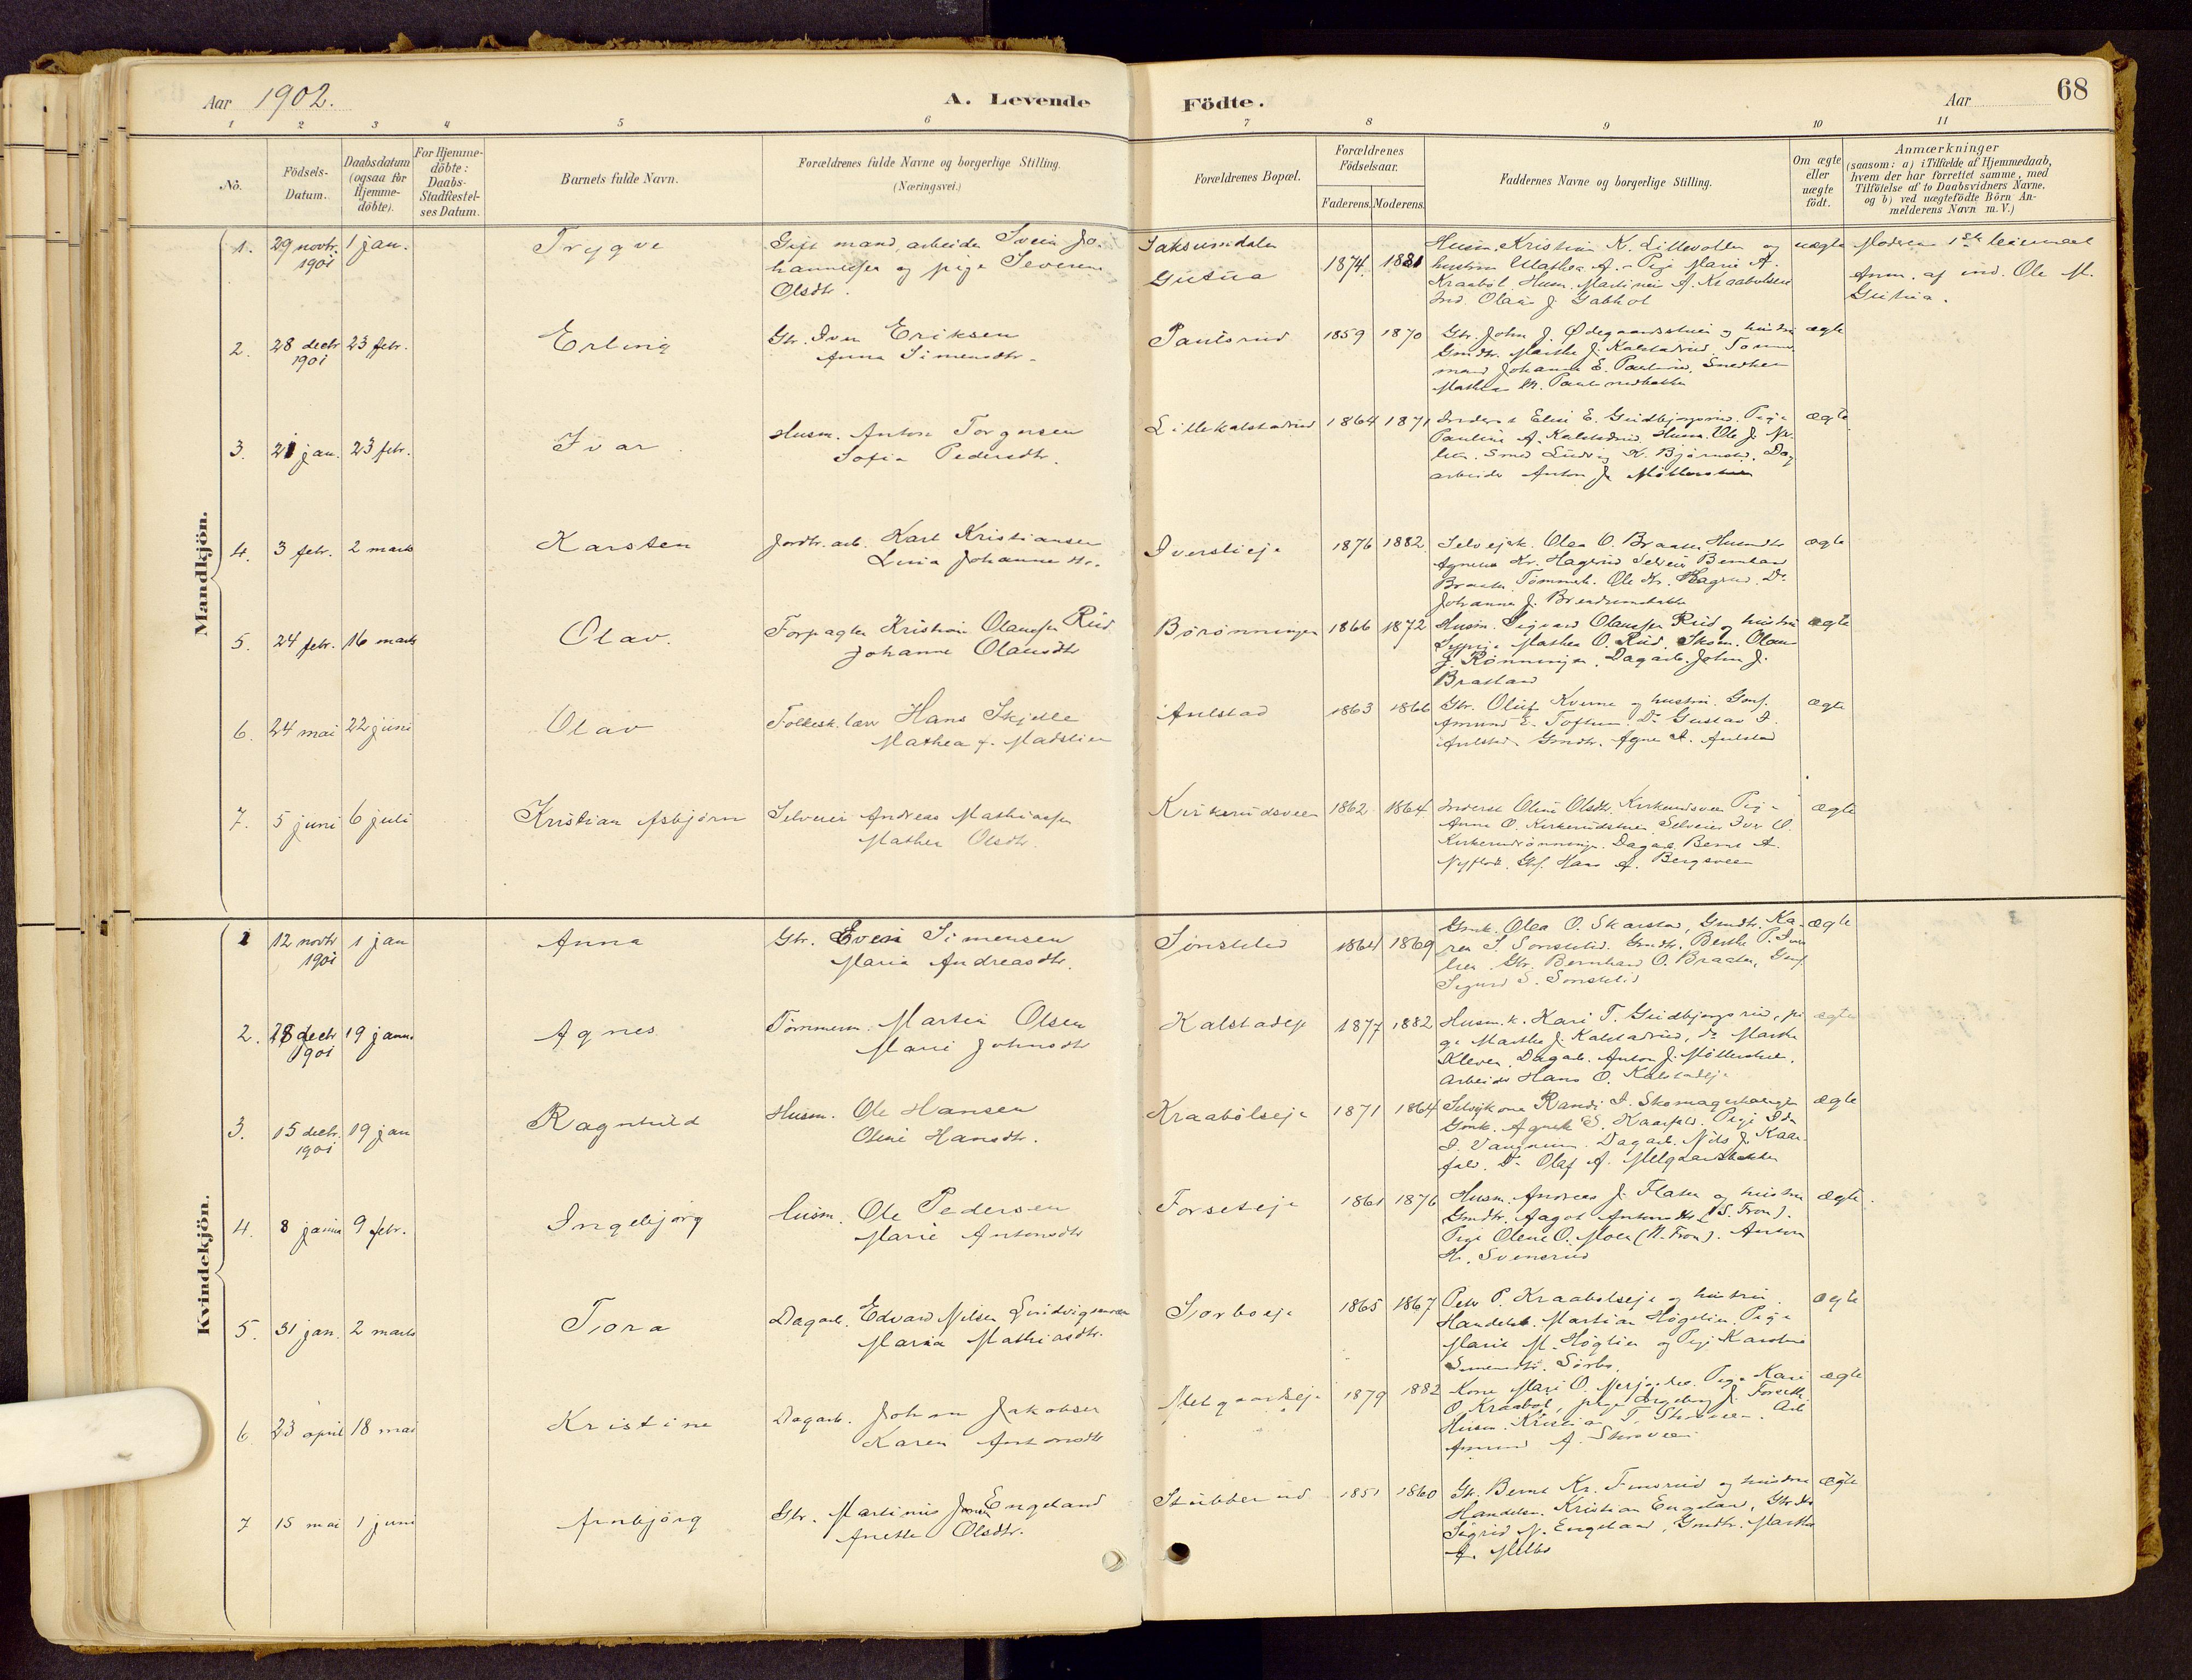 SAH, Vestre Gausdal prestekontor, Ministerialbok nr. 1, 1887-1914, s. 68